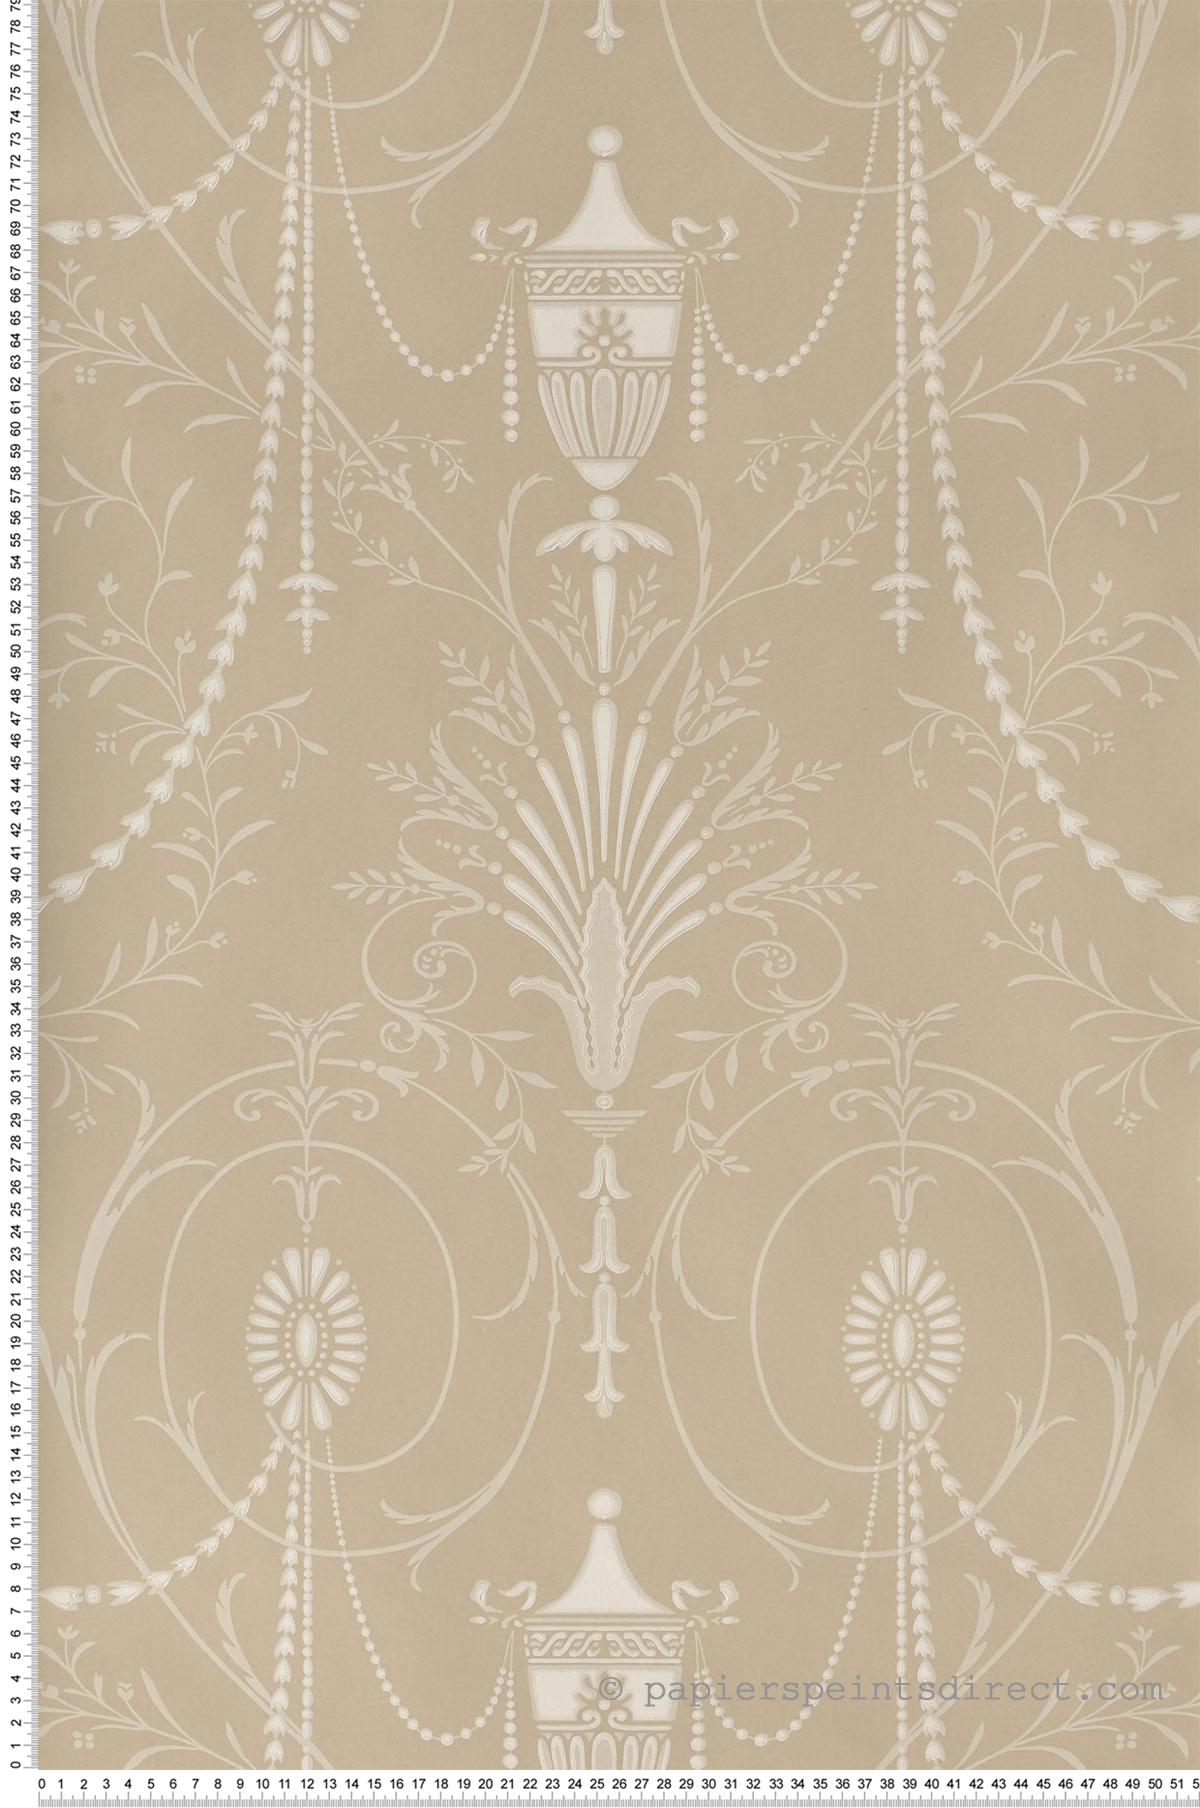 London Wallpapers II, Marlborough, référence : 0273MACHAMP